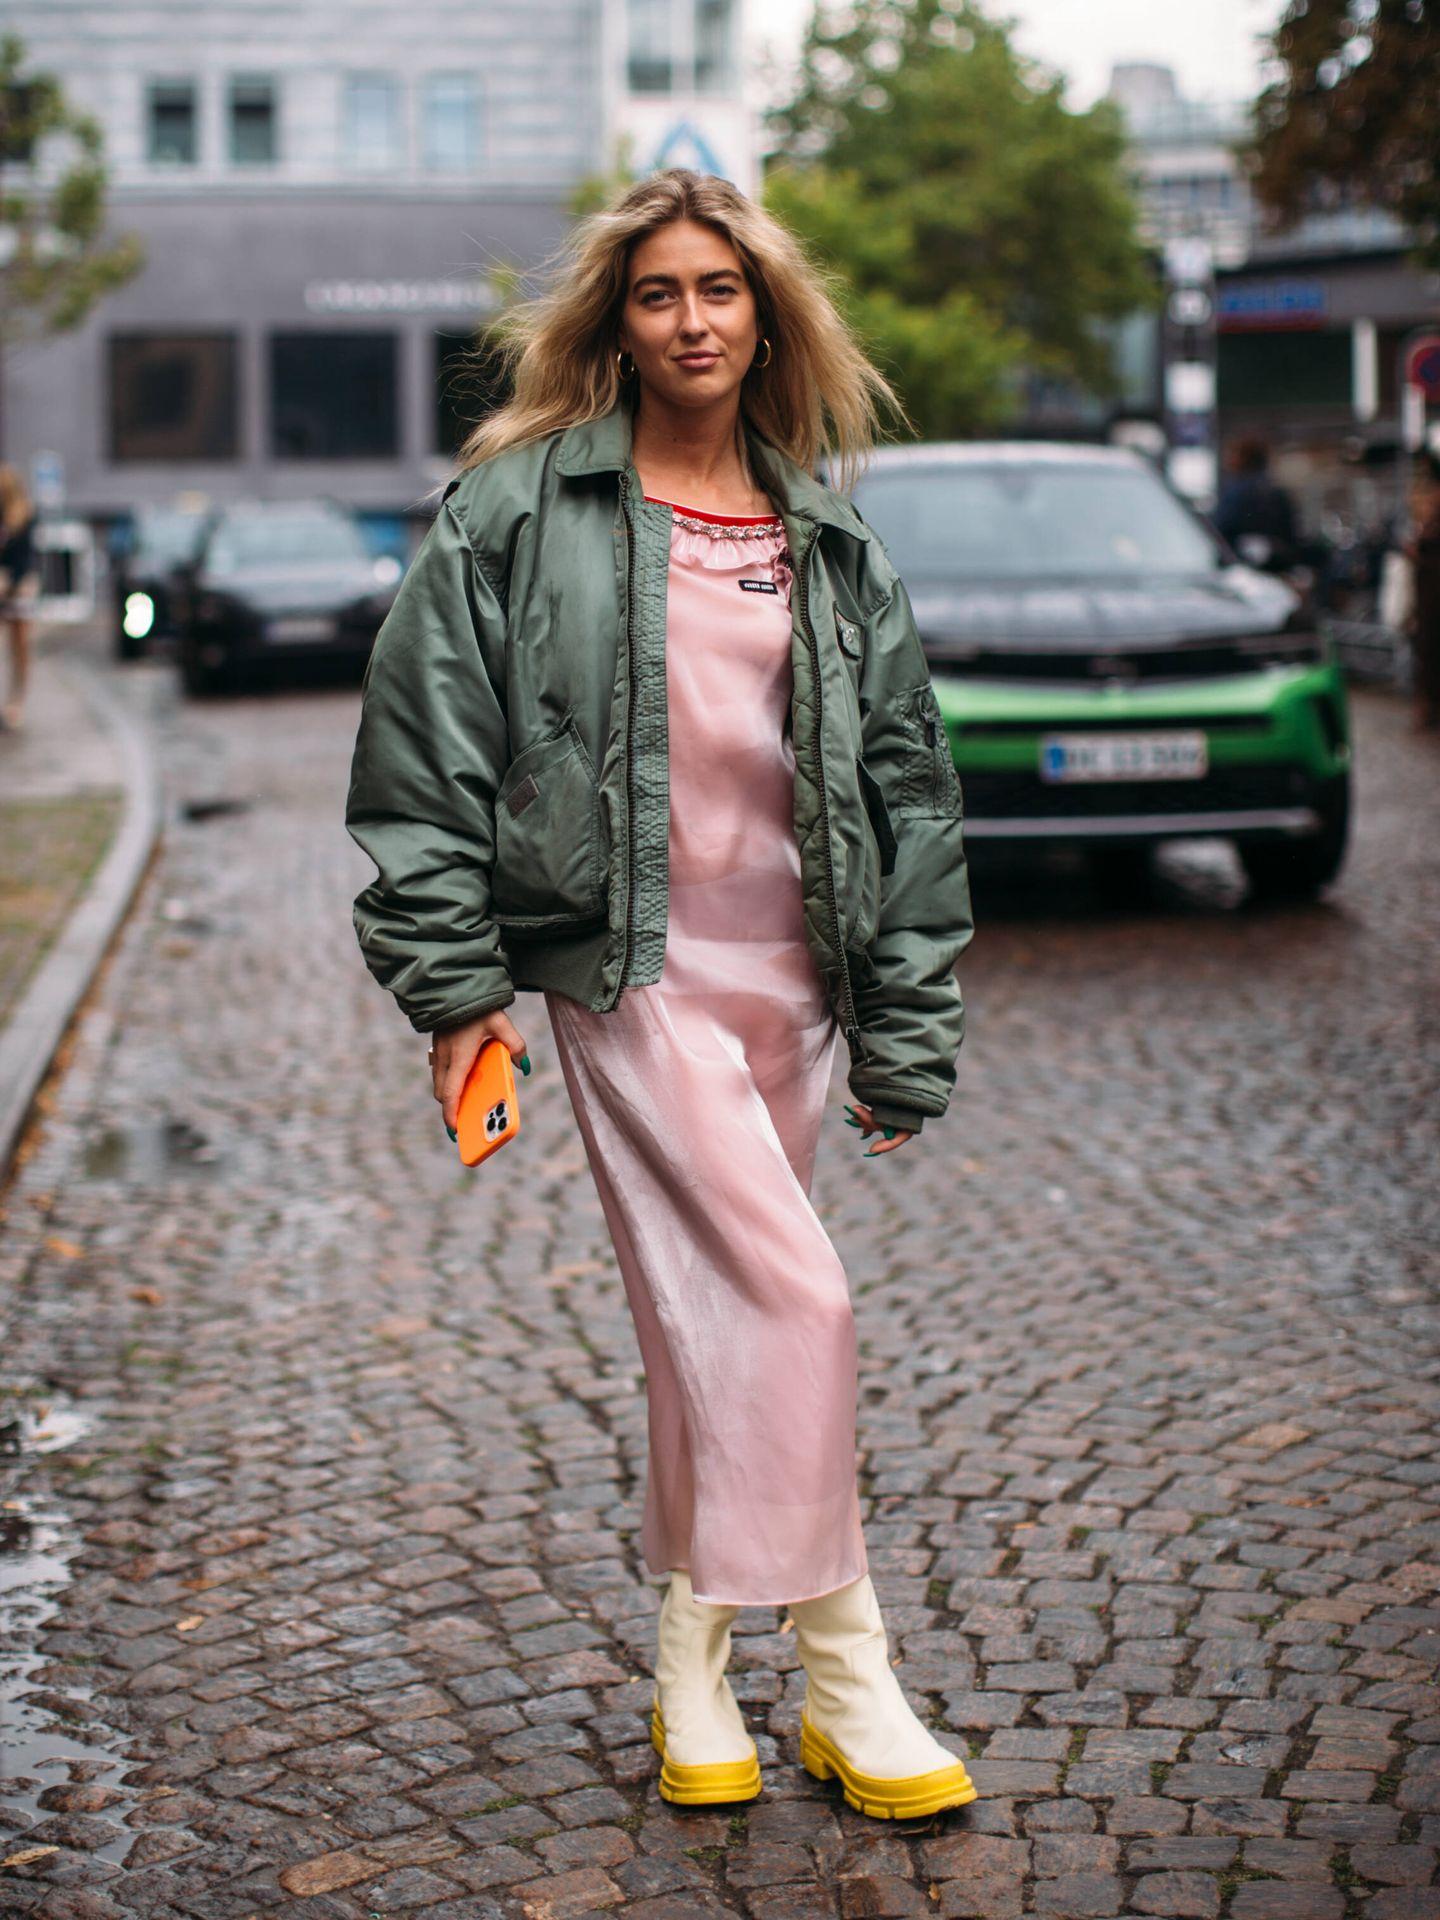 La danesa Emili Sindlev, con una bomber. (Imaxtree)